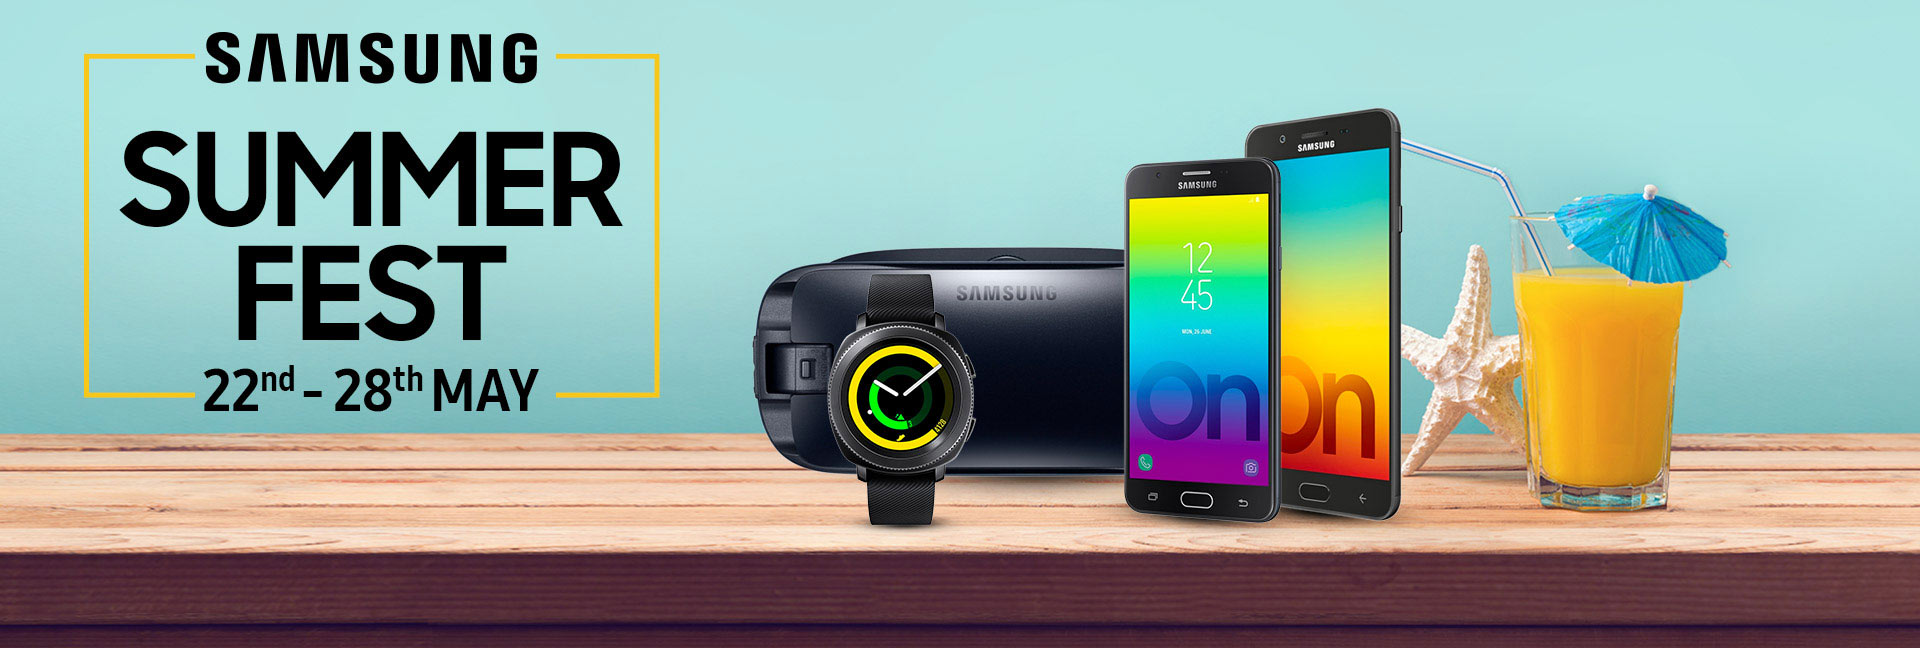 Samsung Summer Fest 22-28 May 2018, citi bank cashback offer